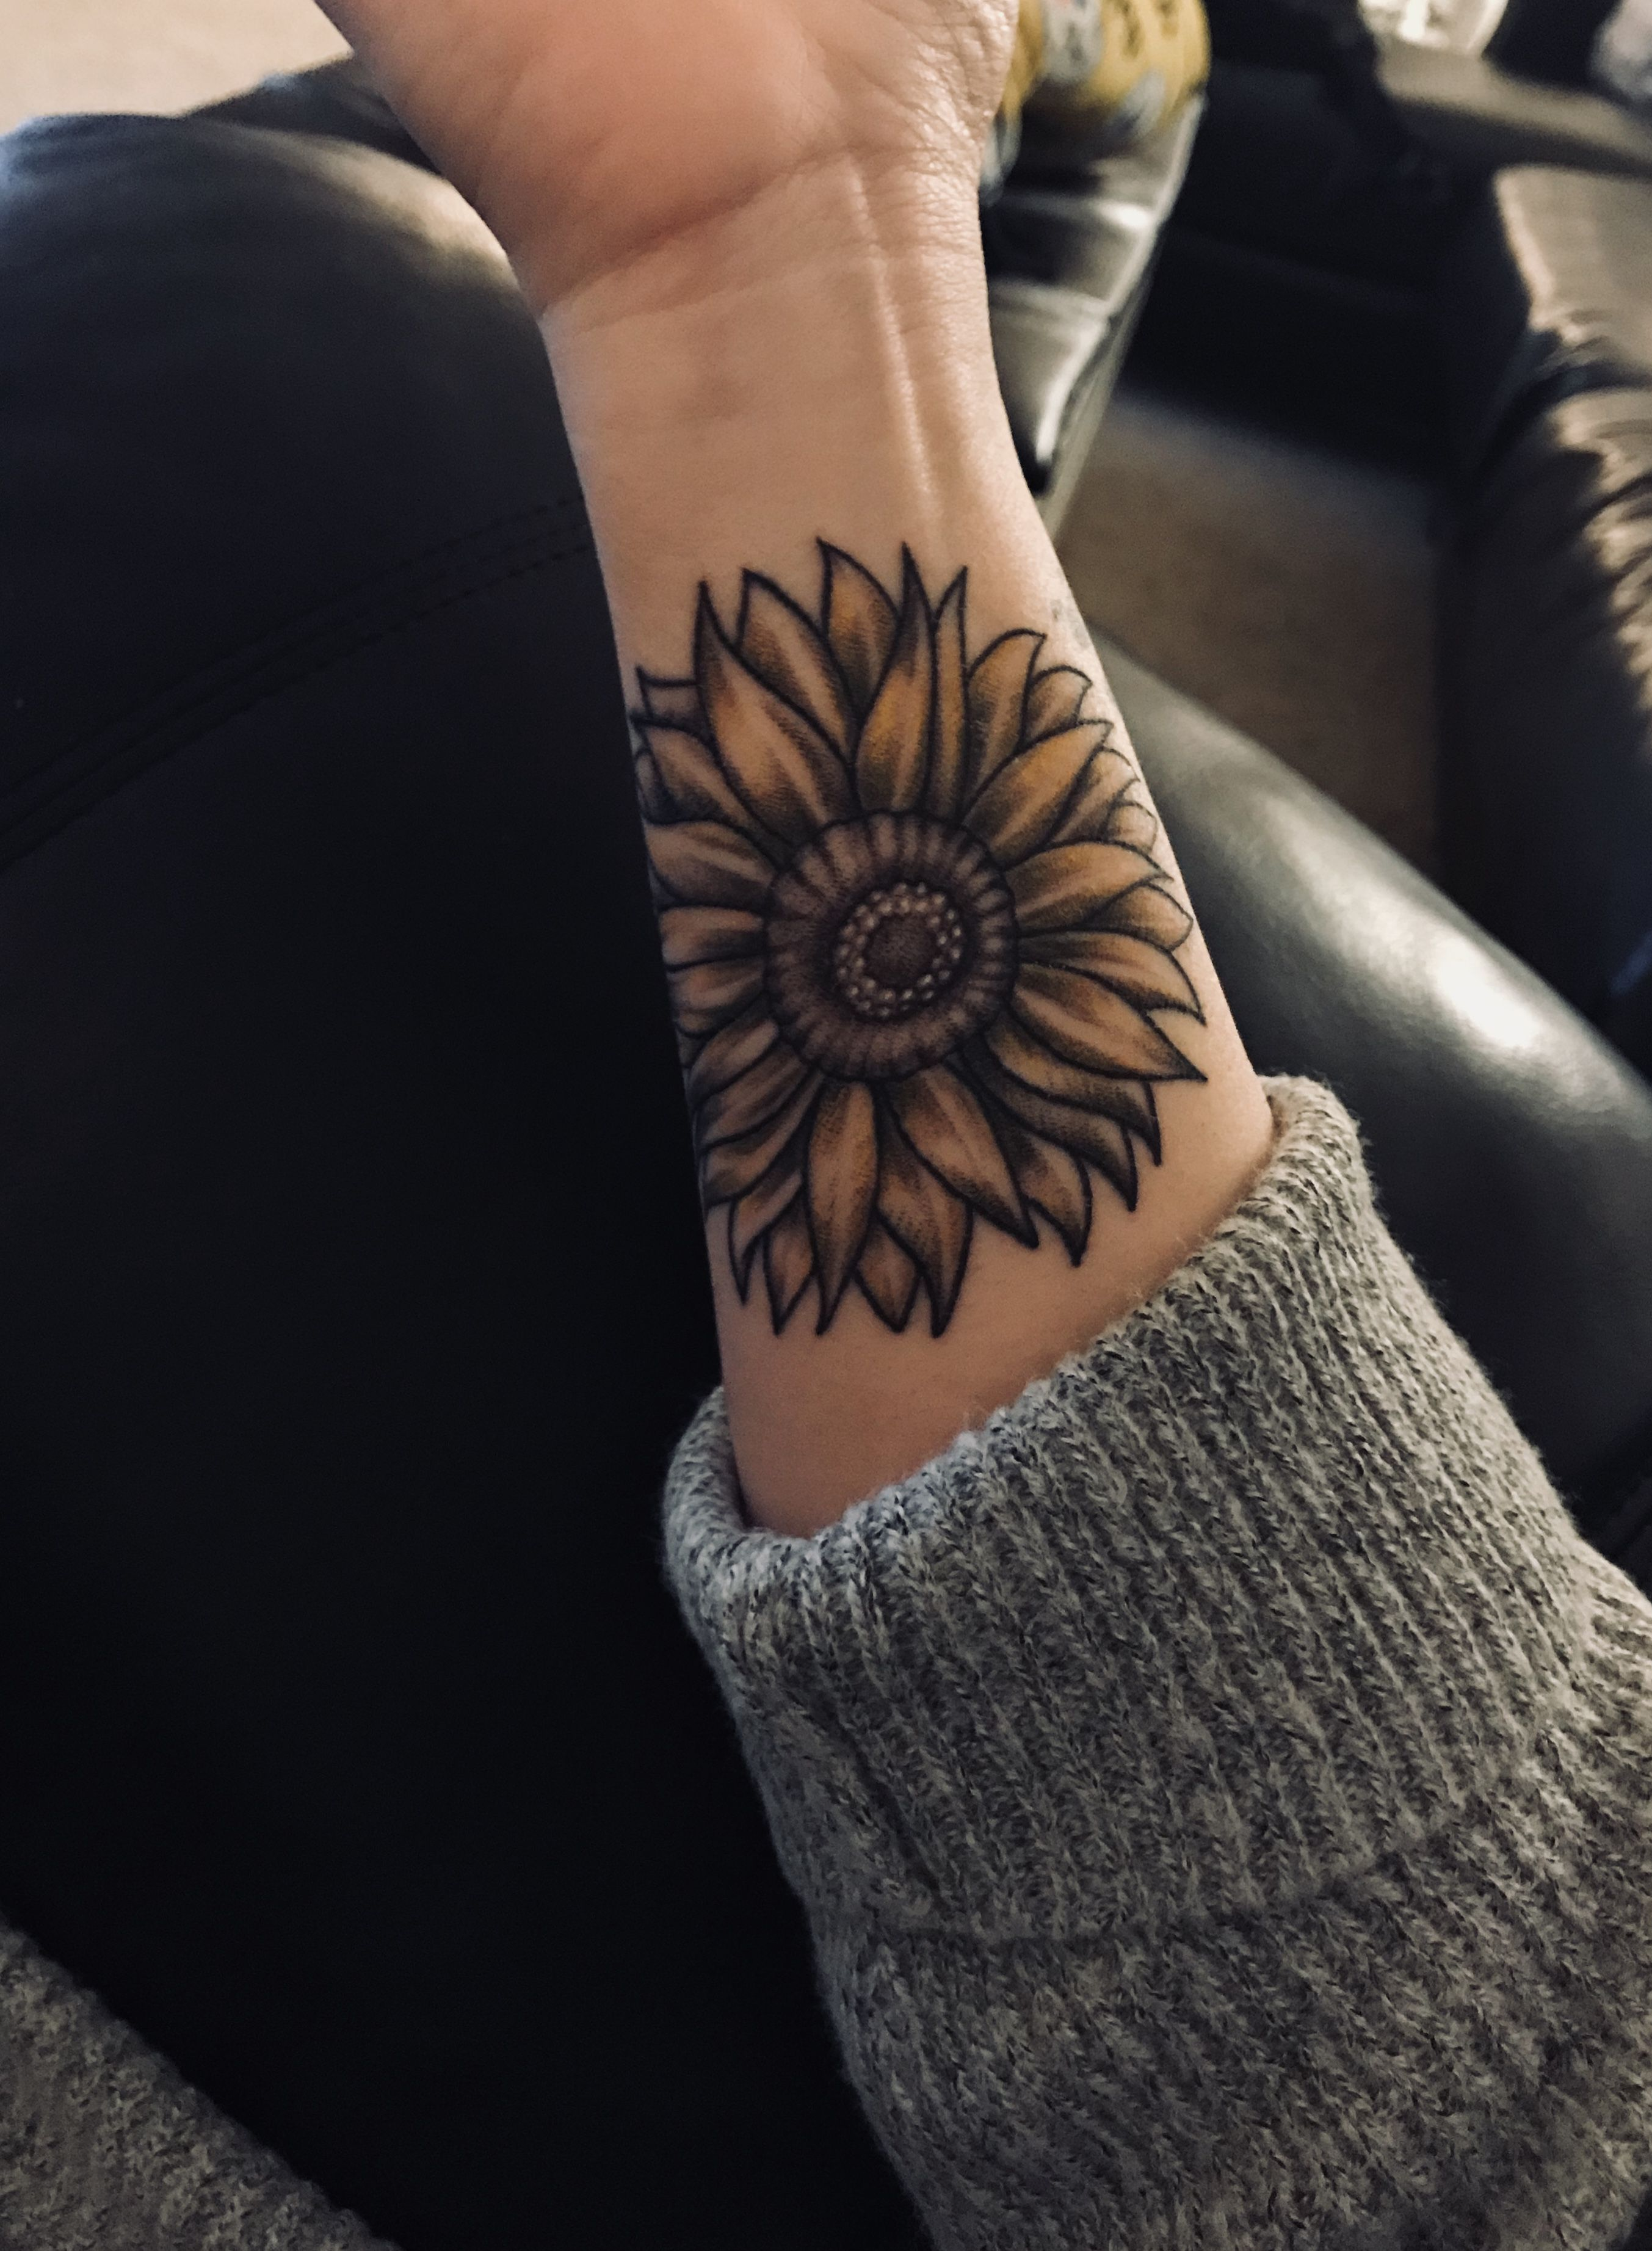 Sunflower Tattoo Aztec Tattoo Designs Sunflower Tattoos